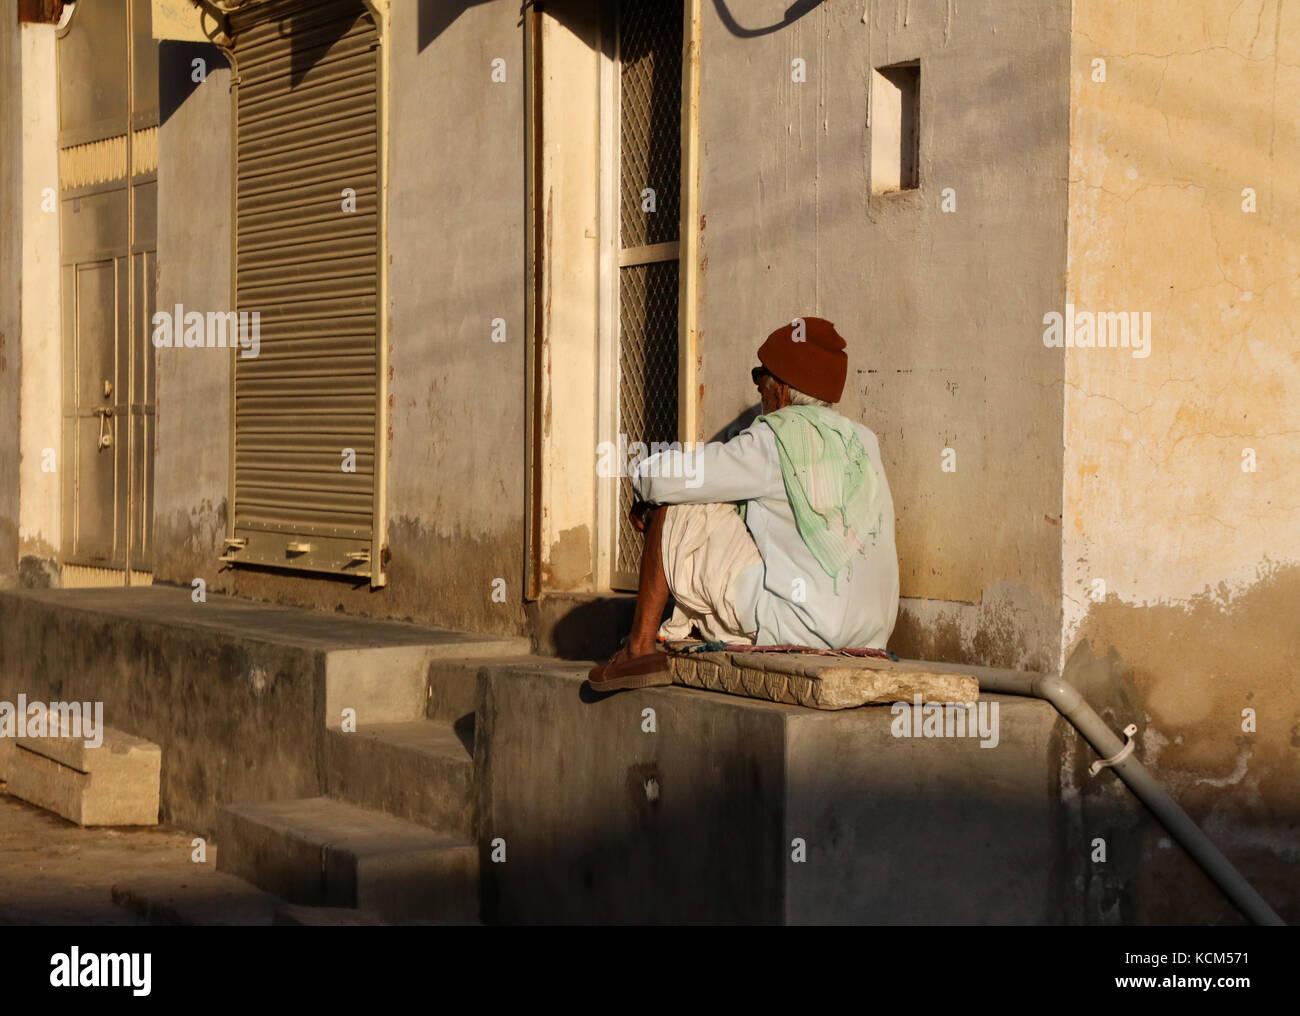 Man sitting on doorstep with back to camera - Stock Image